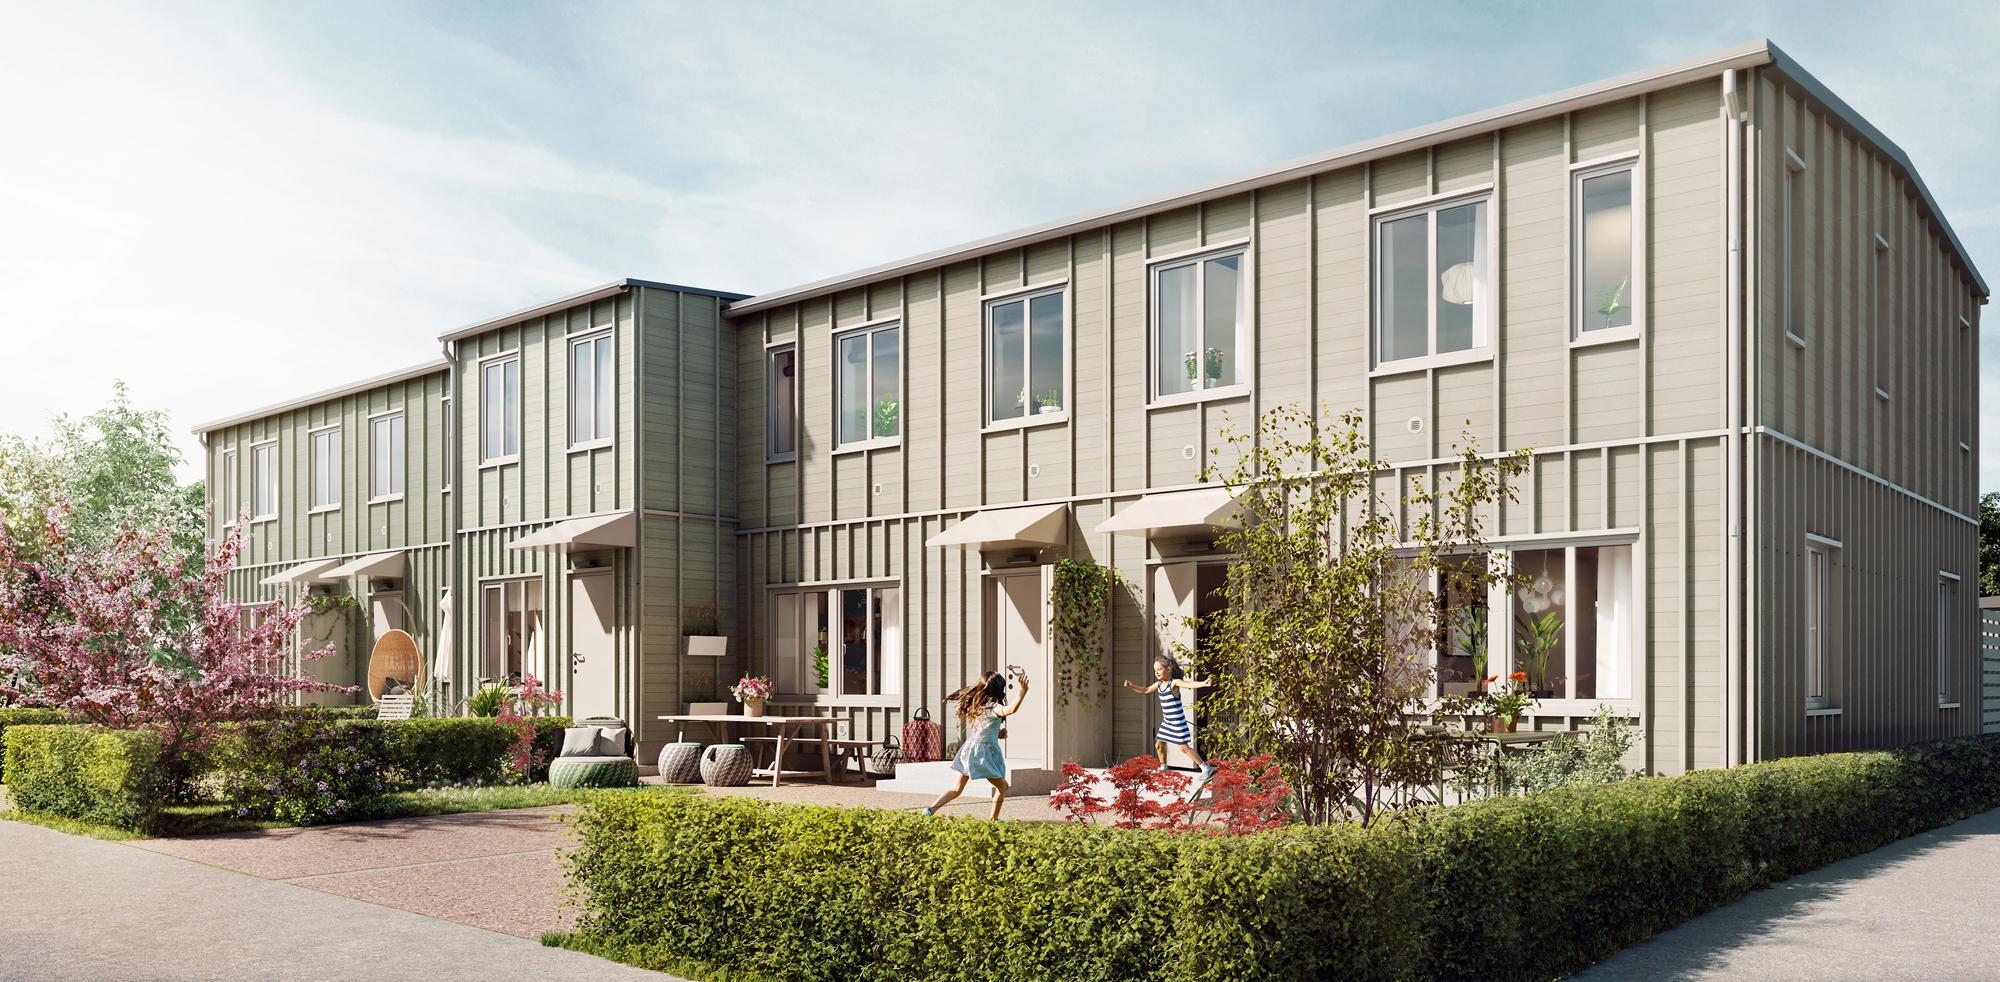 nyproduktion stockholm, säljstart, nybygge, nybyggnation